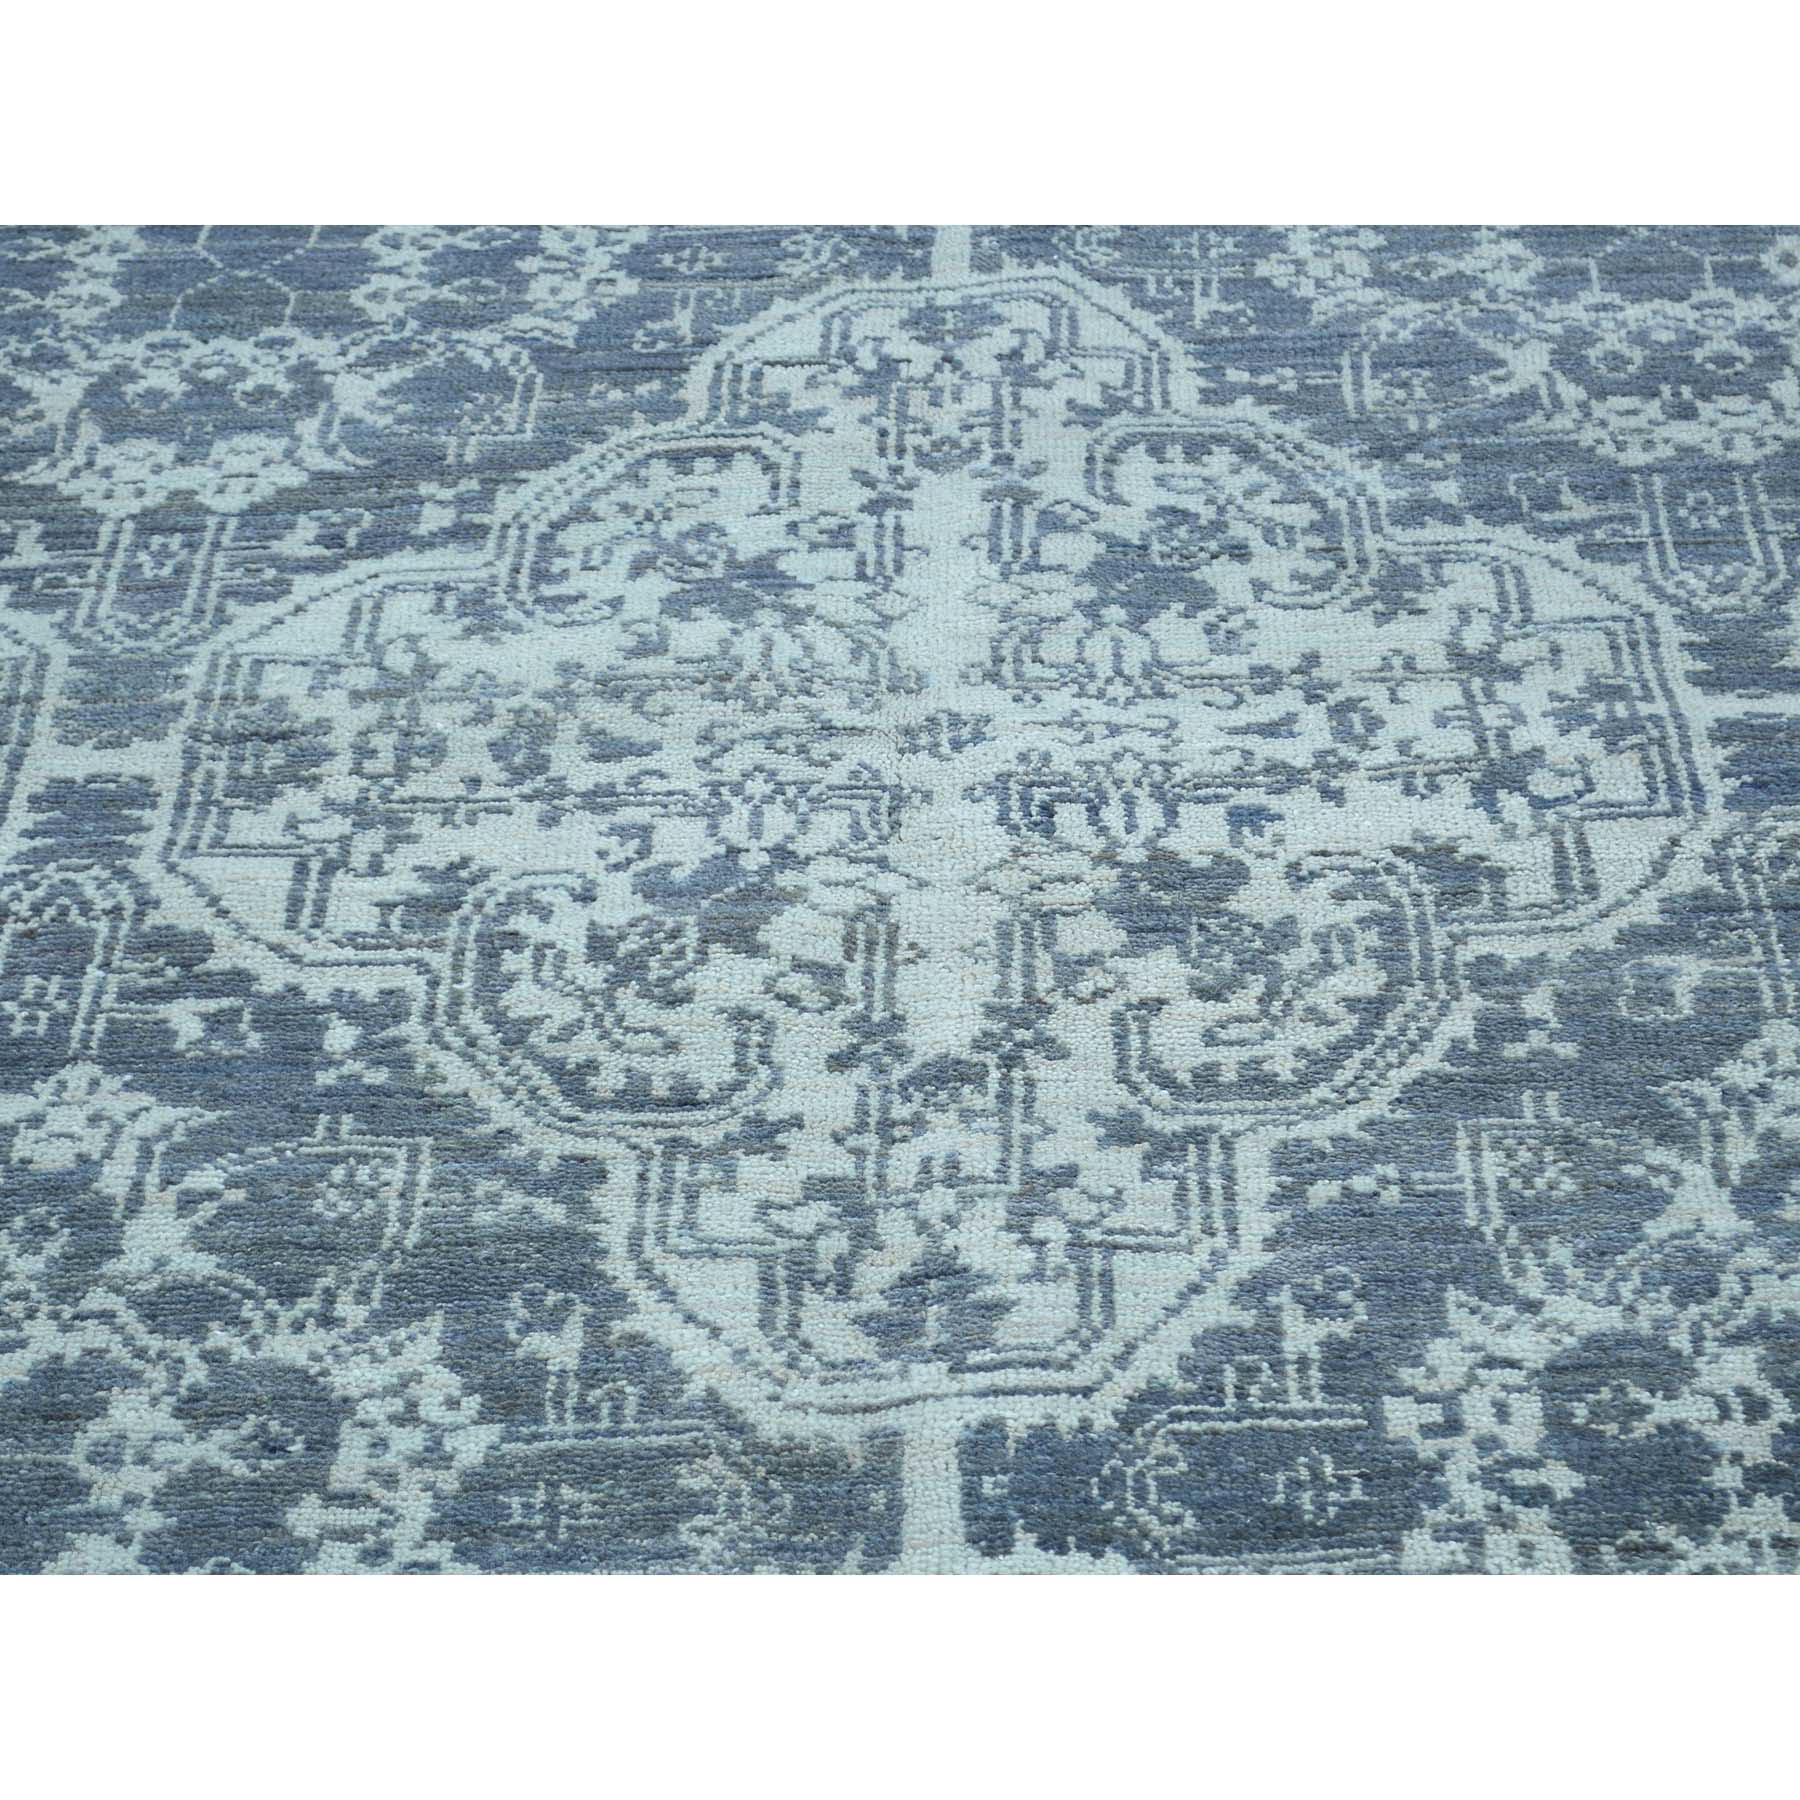 "7'8""x10' Handmade Wool And Silk Geometric Moughal Design Oriental Rug"